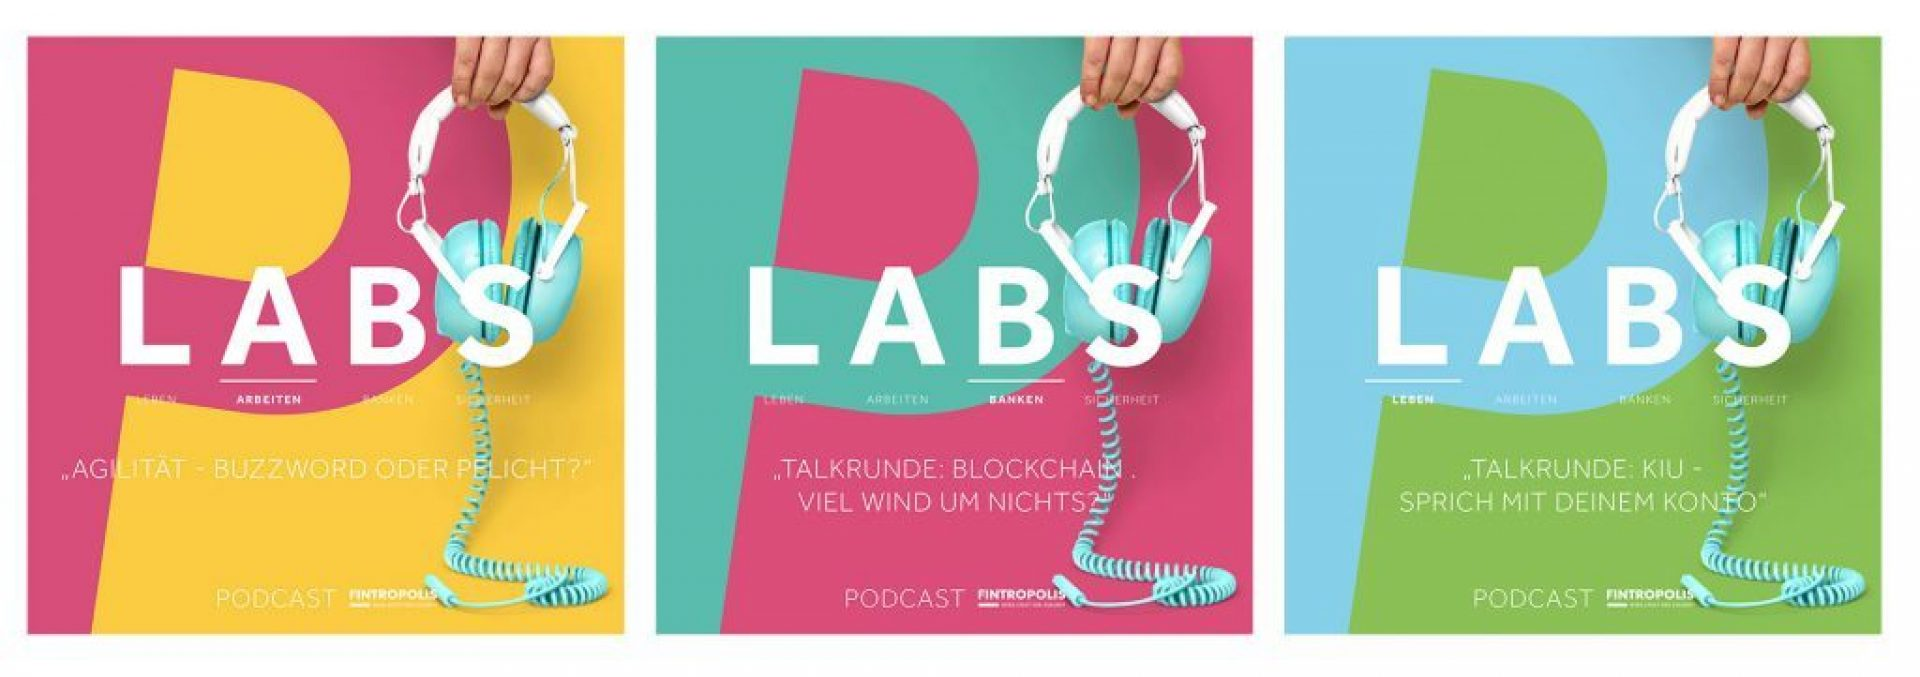 Fiducia & GAD Podcast: LABS